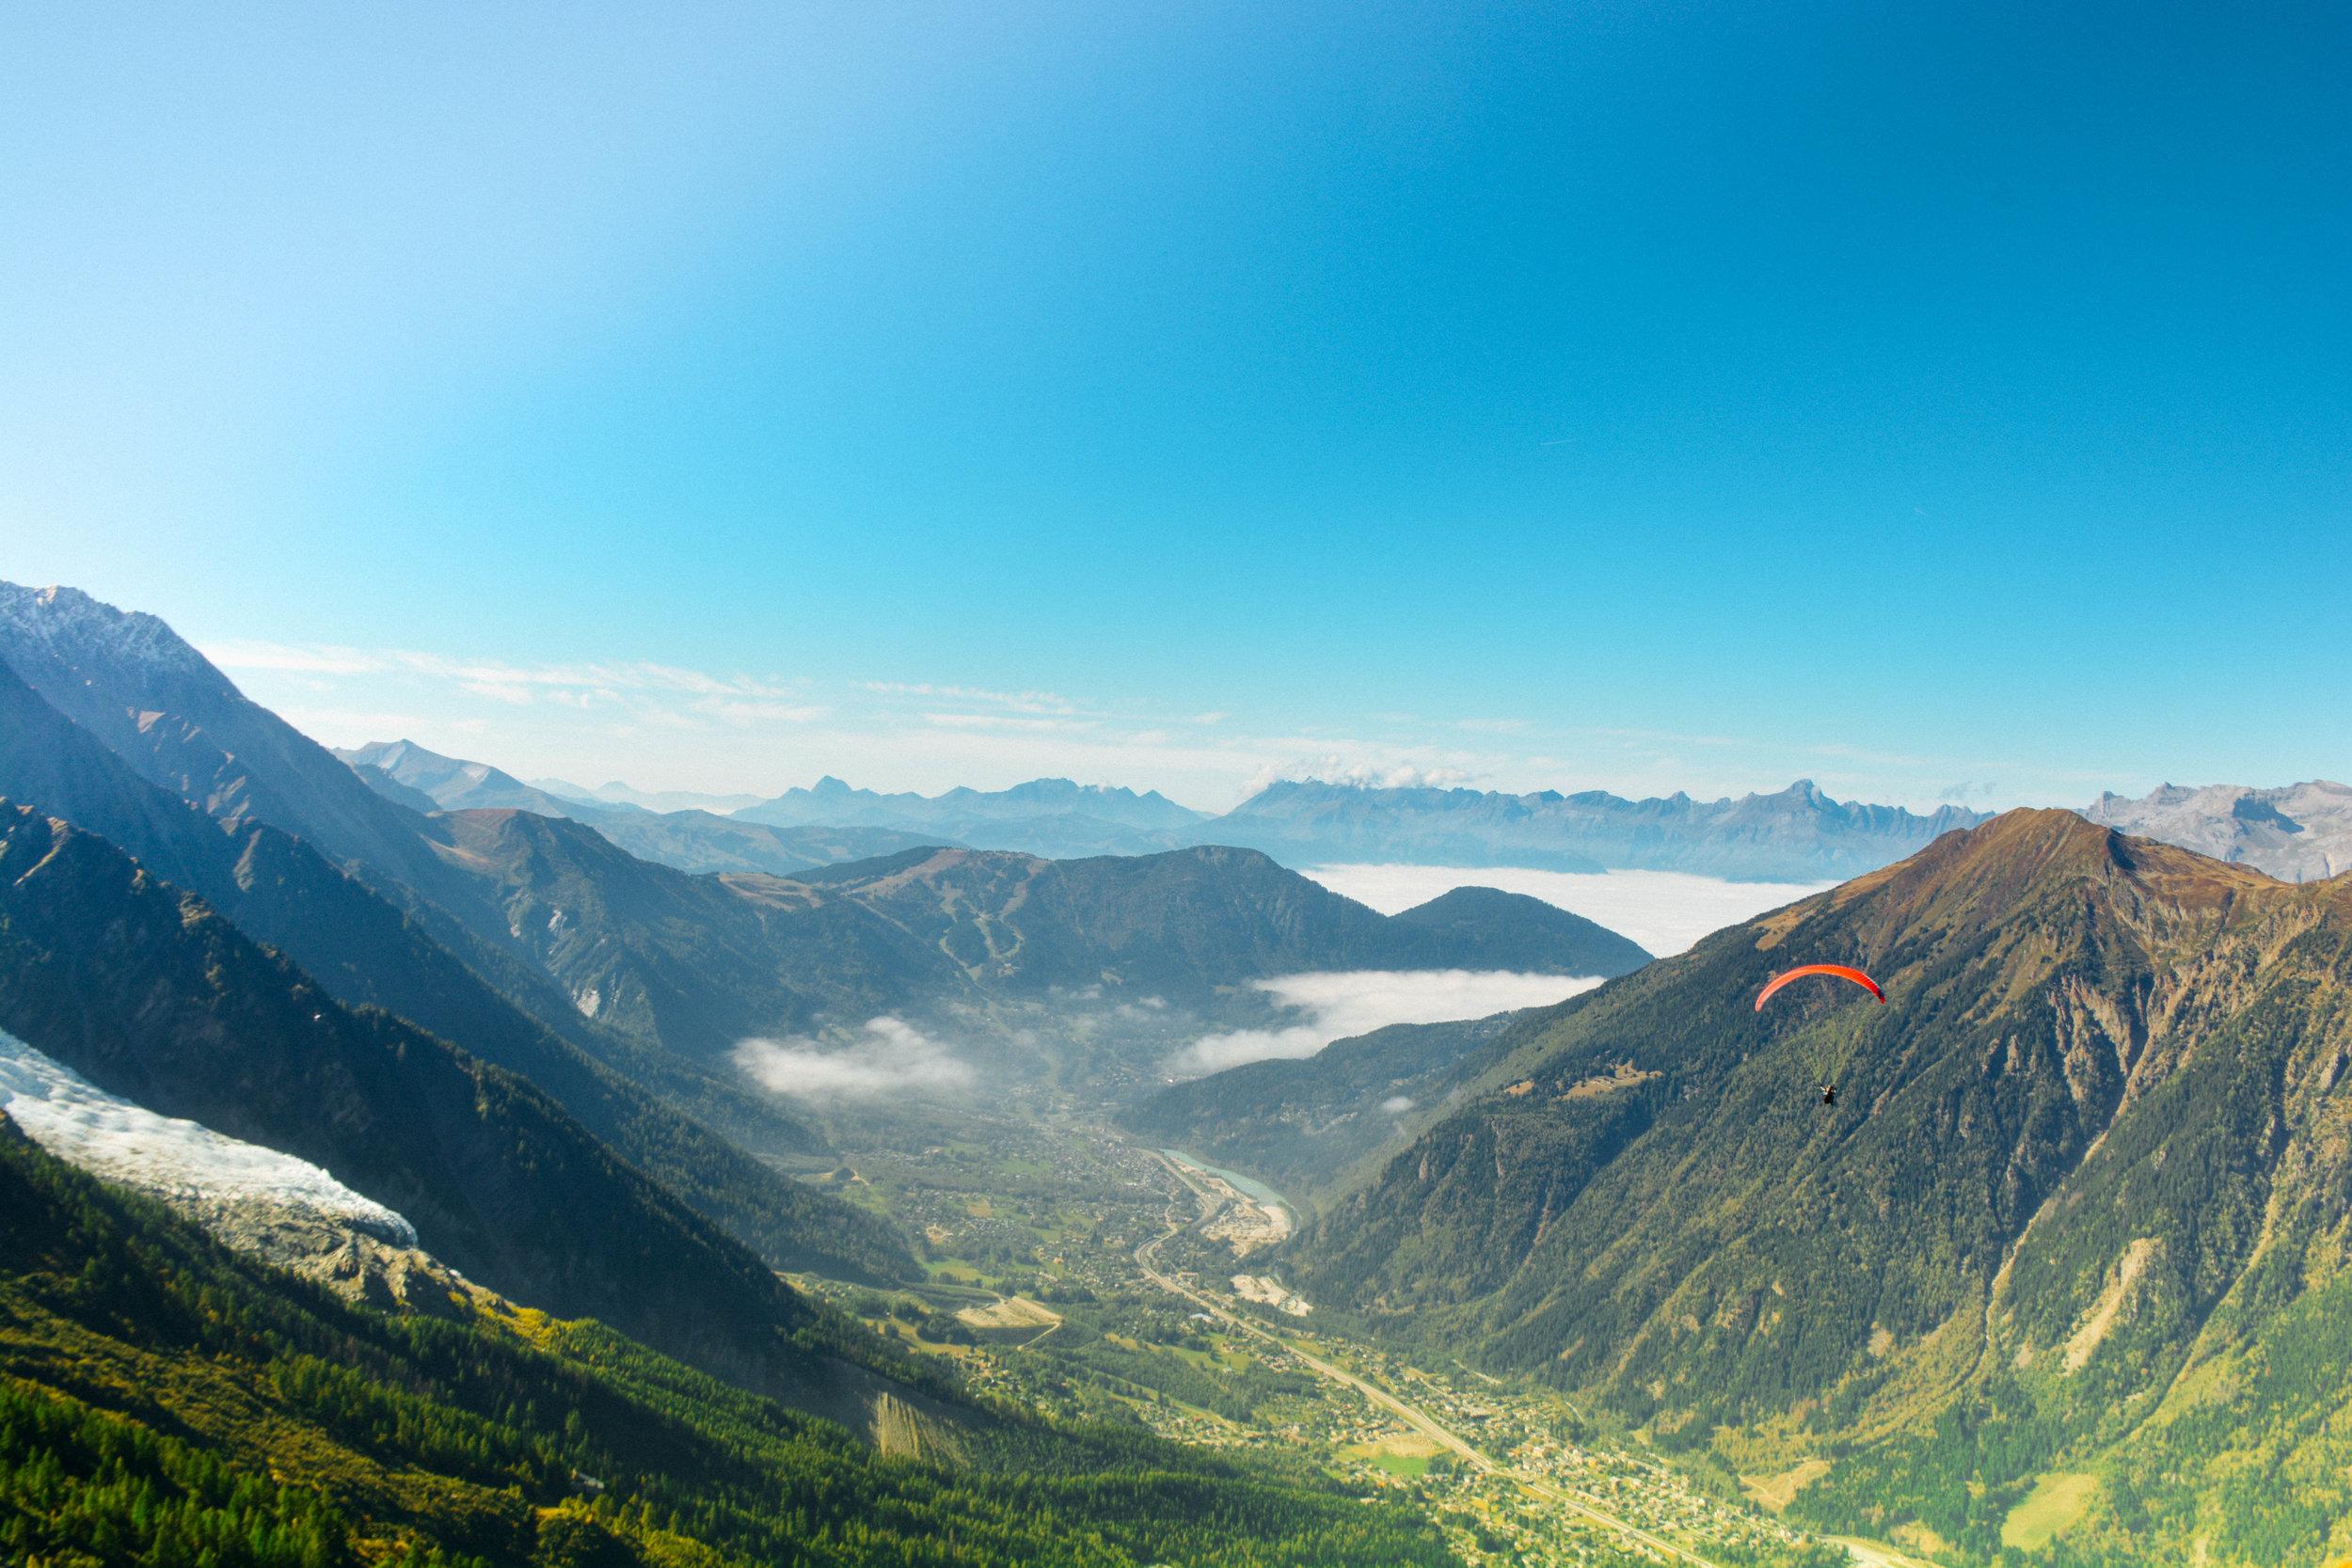 Paragliding in Chamonix, France